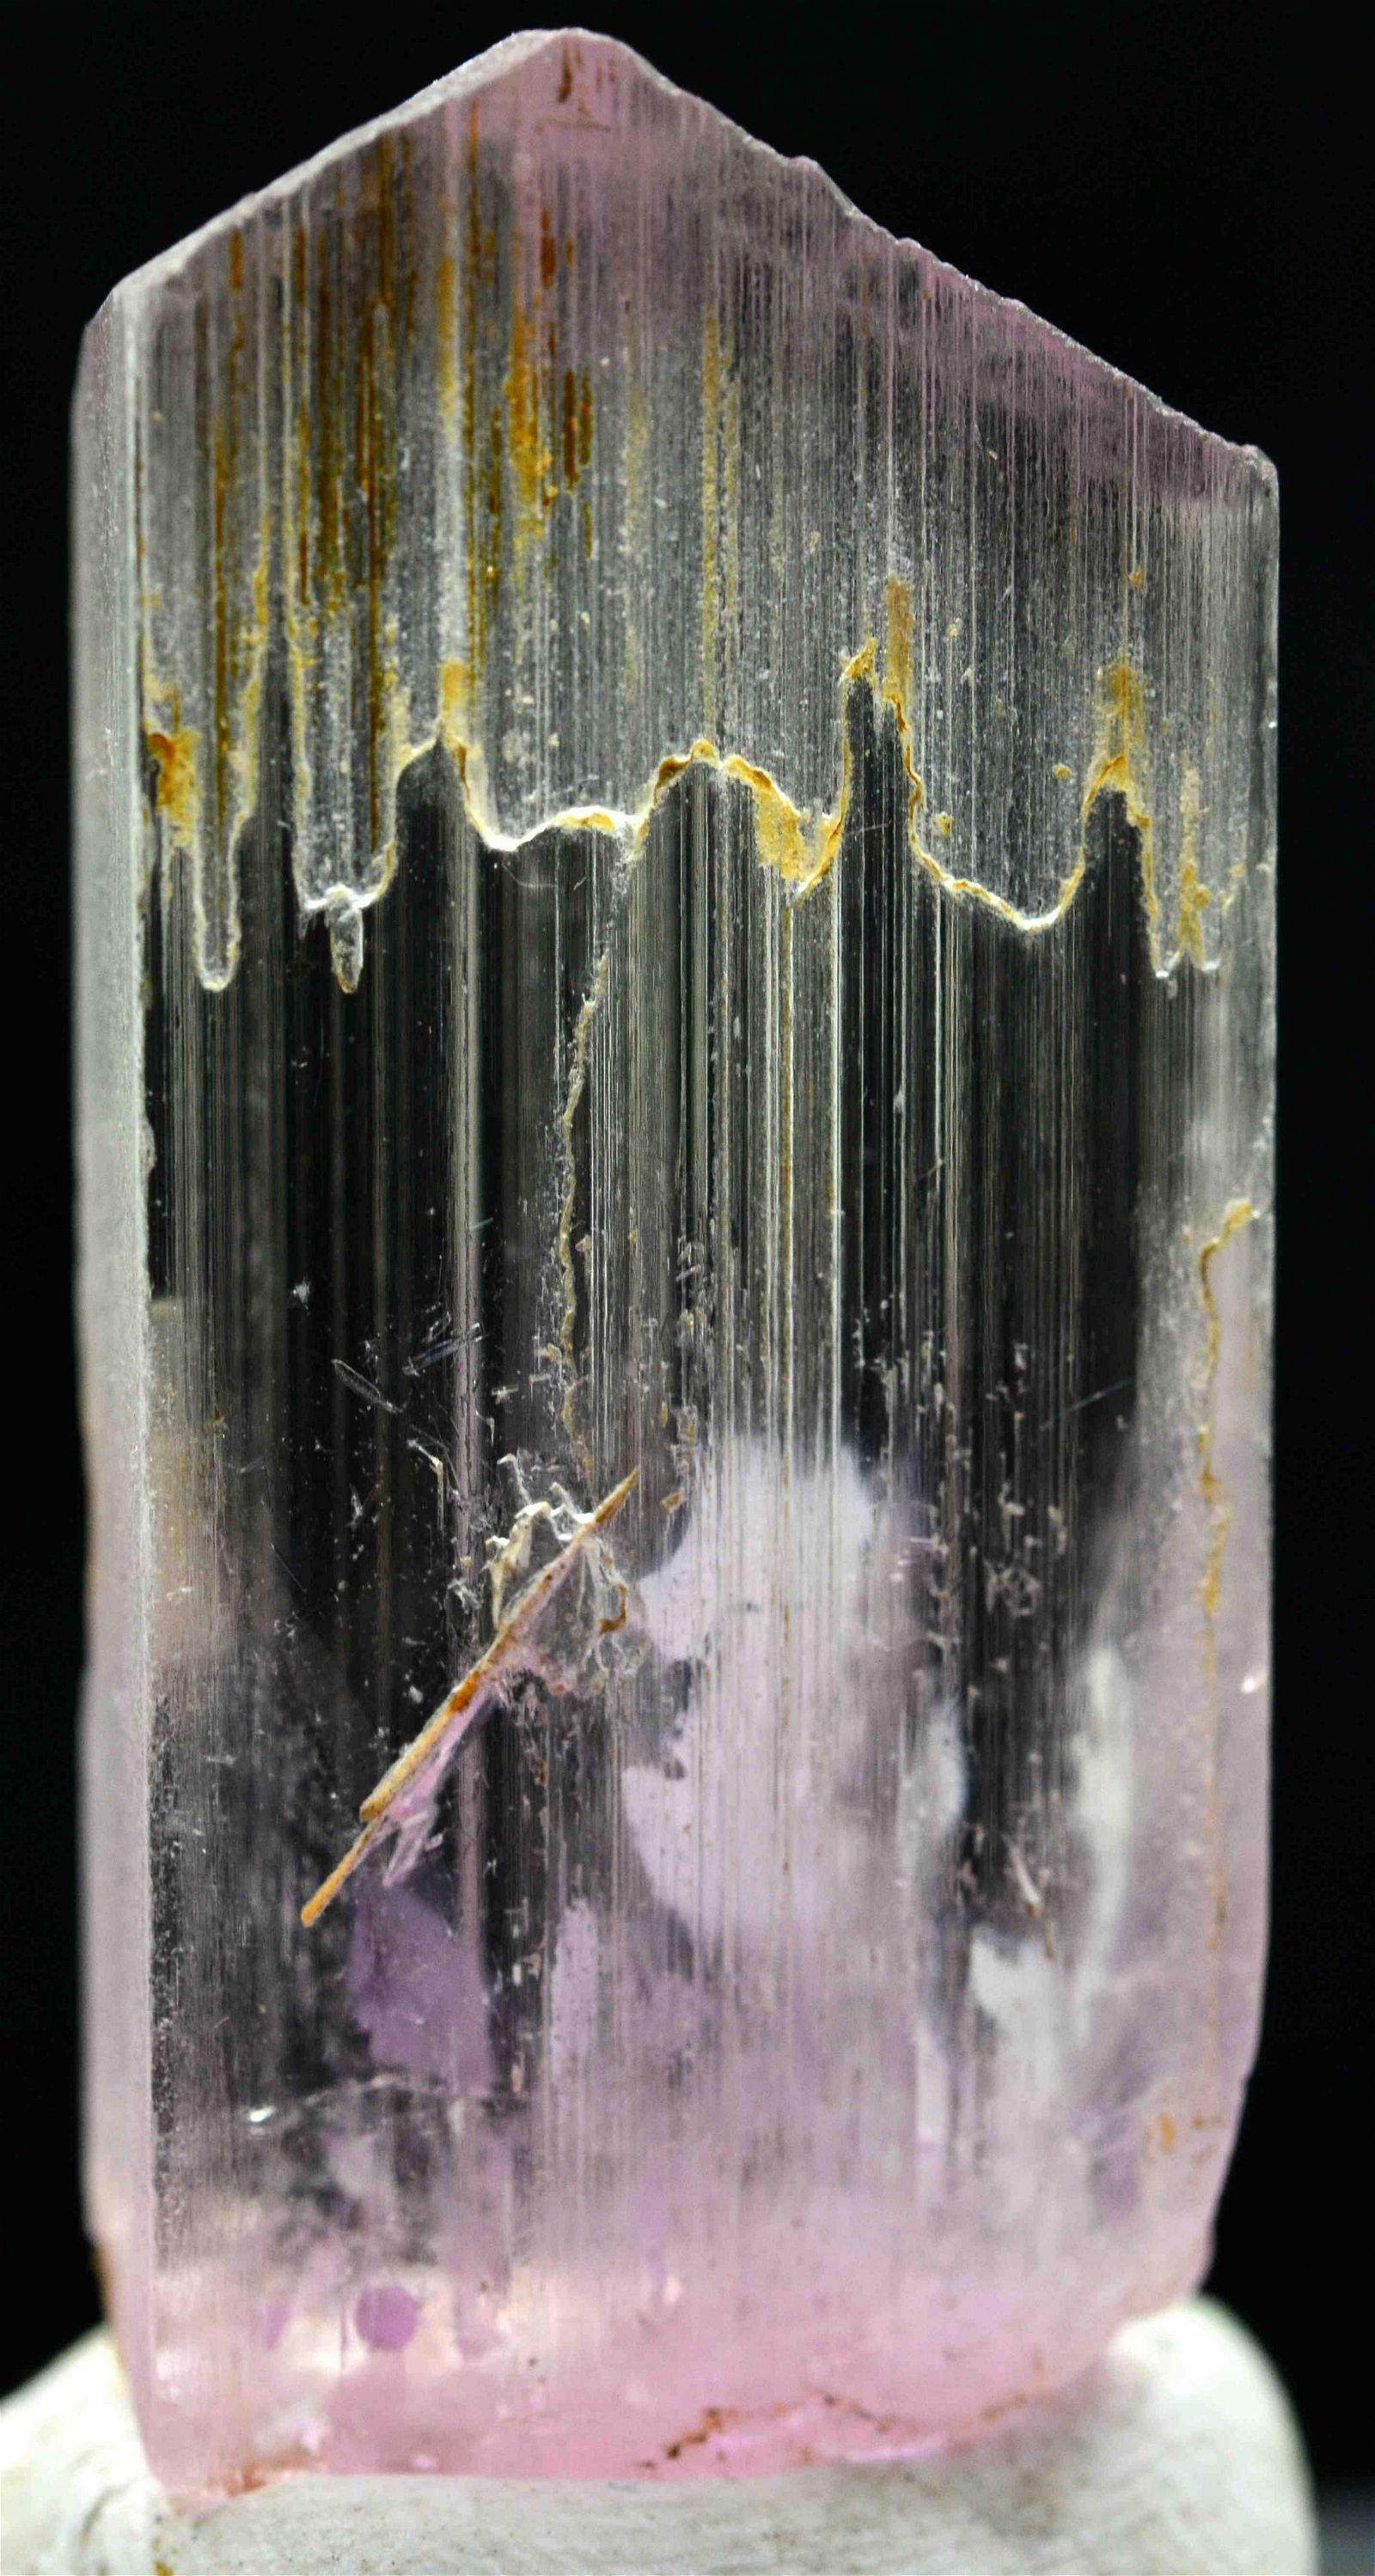 15 Grams VShape Terminated Beautiful Kunzite Crystal